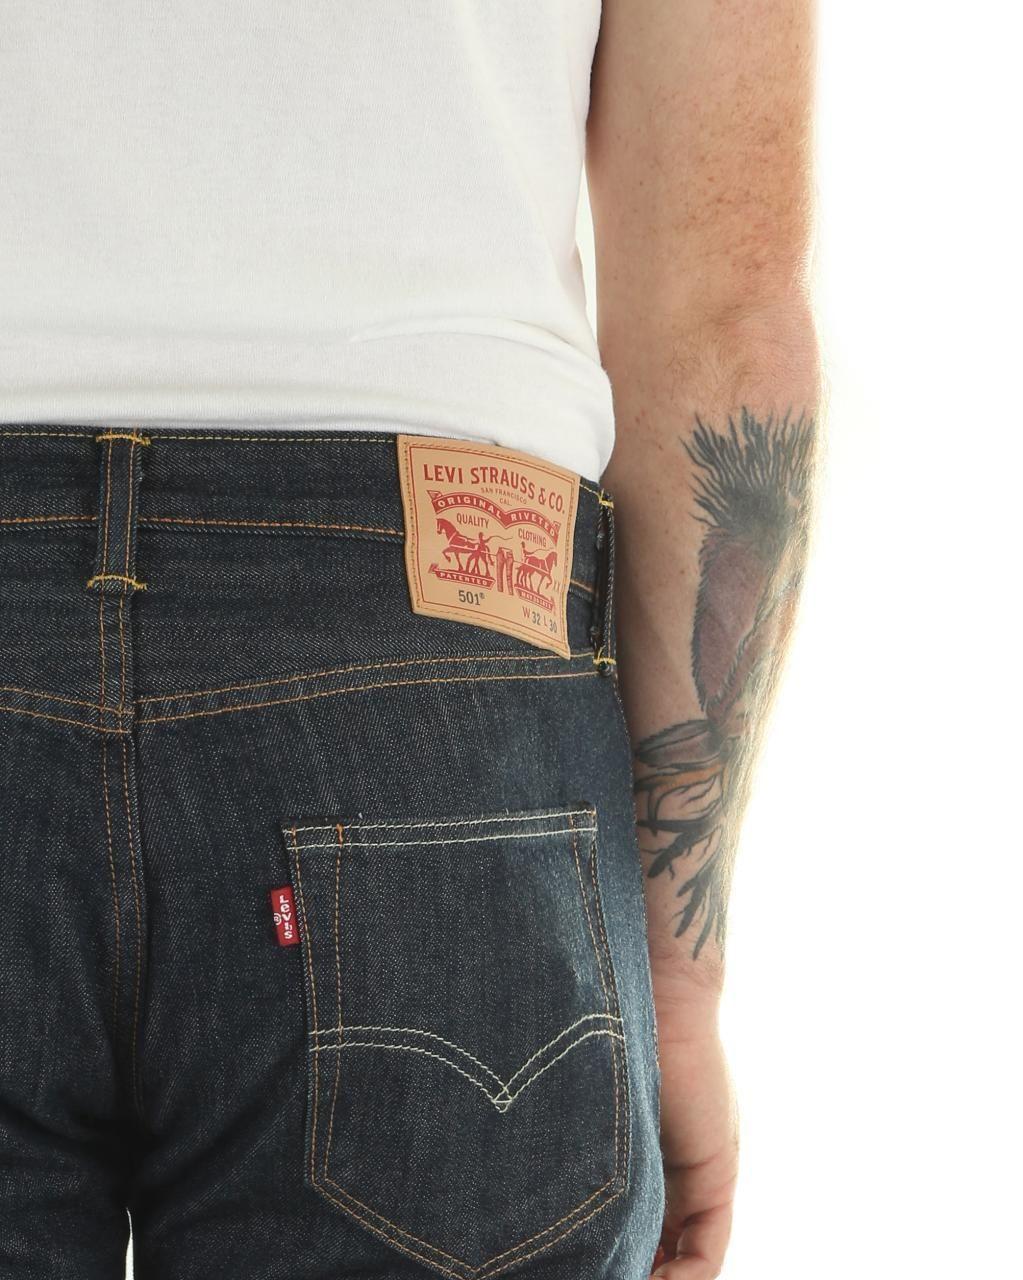 Levis 501 Original Regular Fit Mens Jeans Marlon Mens Jeans Levis 501 Mens Straight Jeans